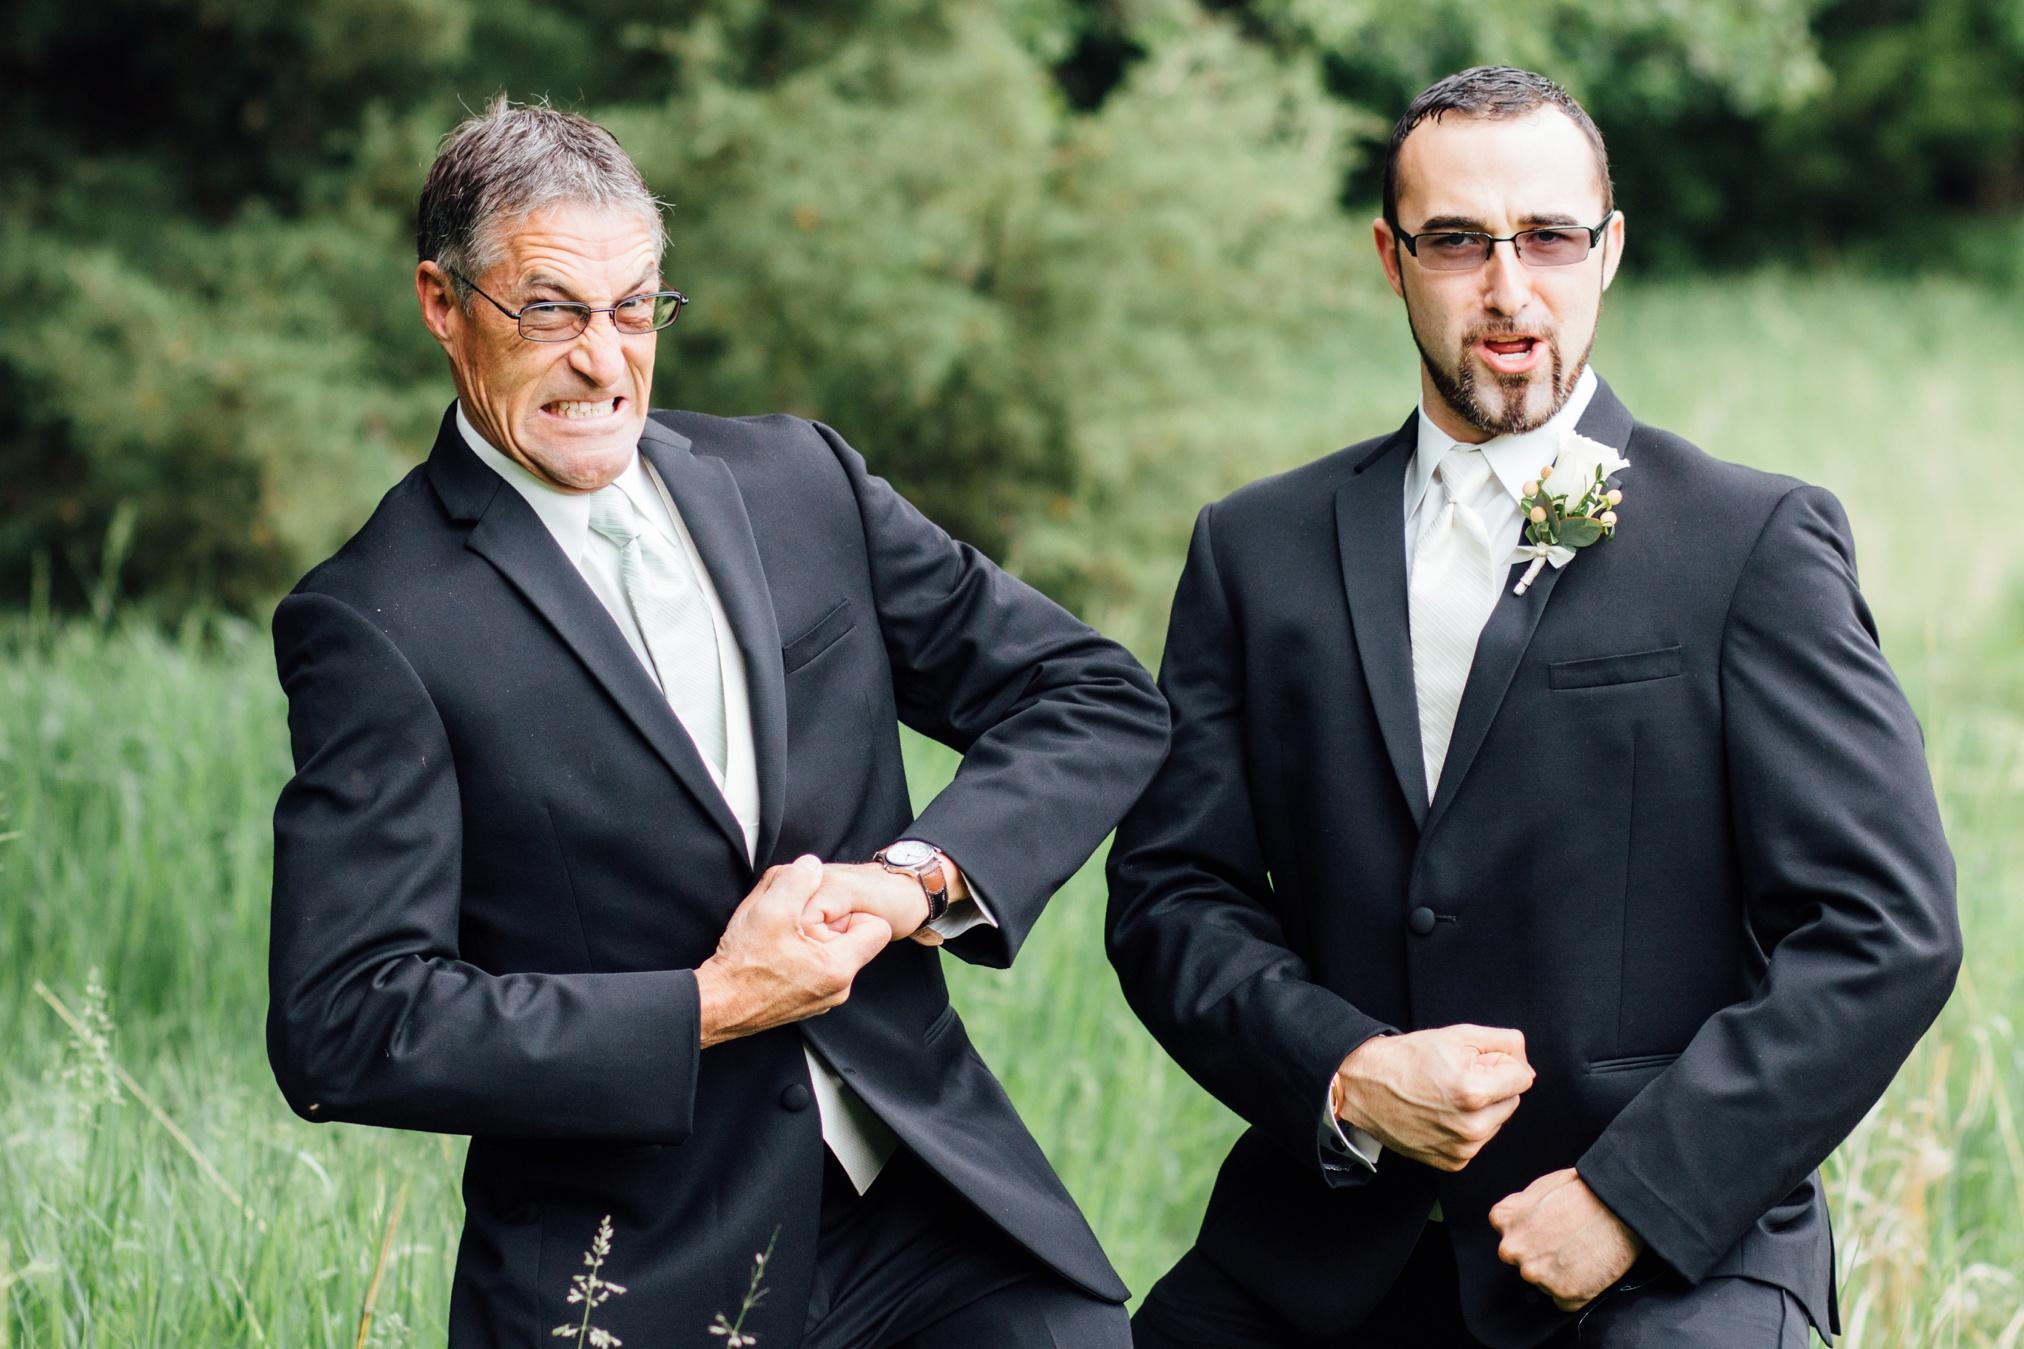 schmid_wedding-213.jpg